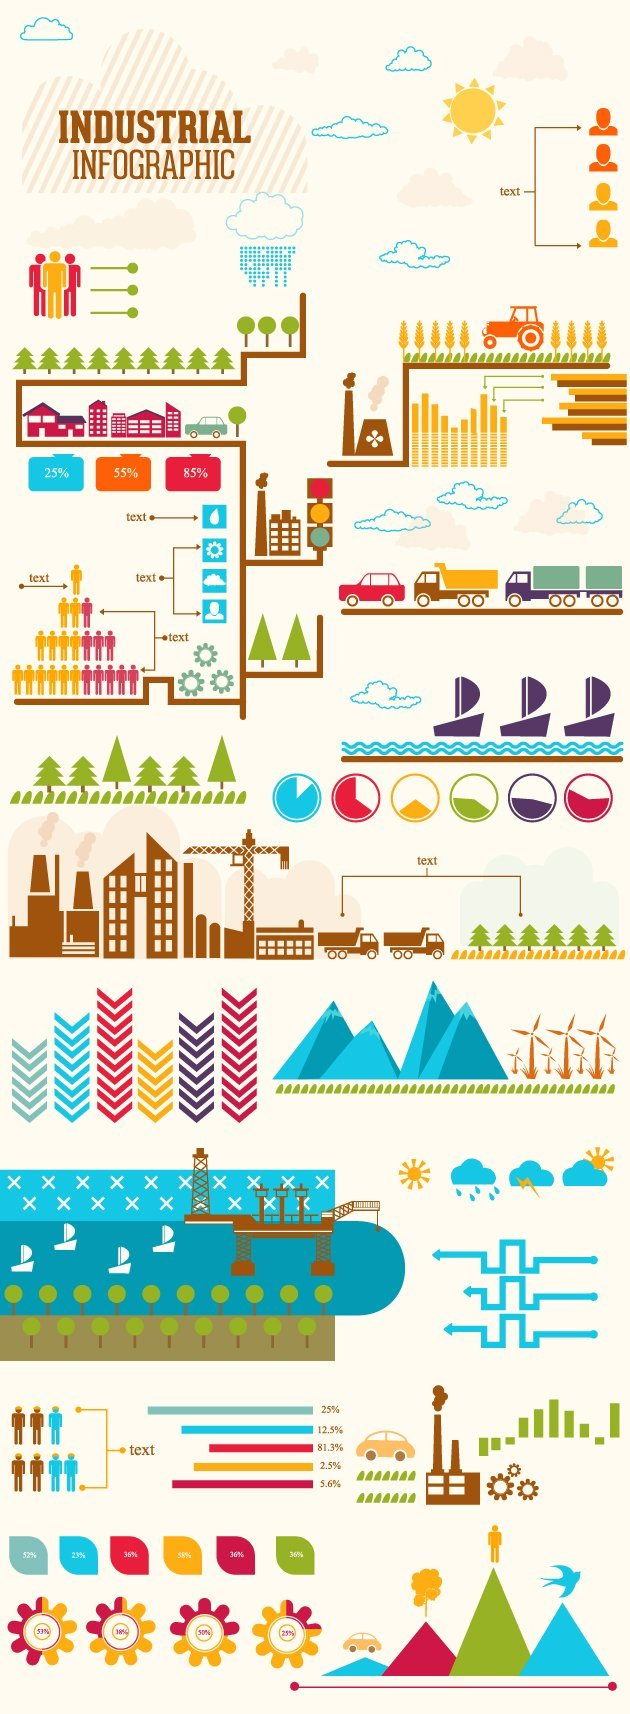 industrial-infographic-vector